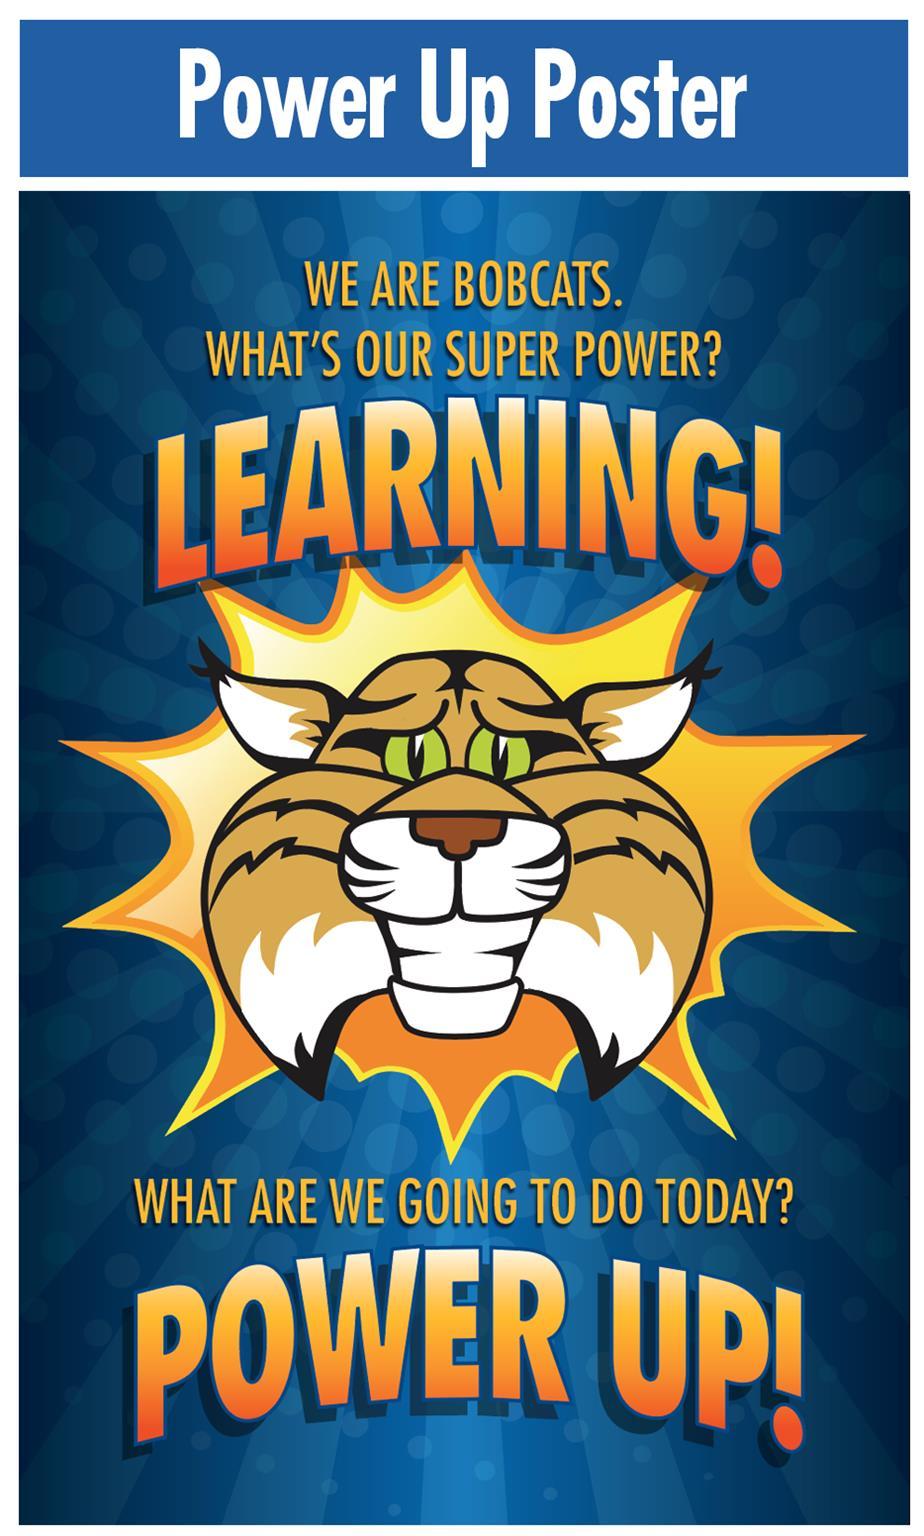 Power Up Poster Bobcat